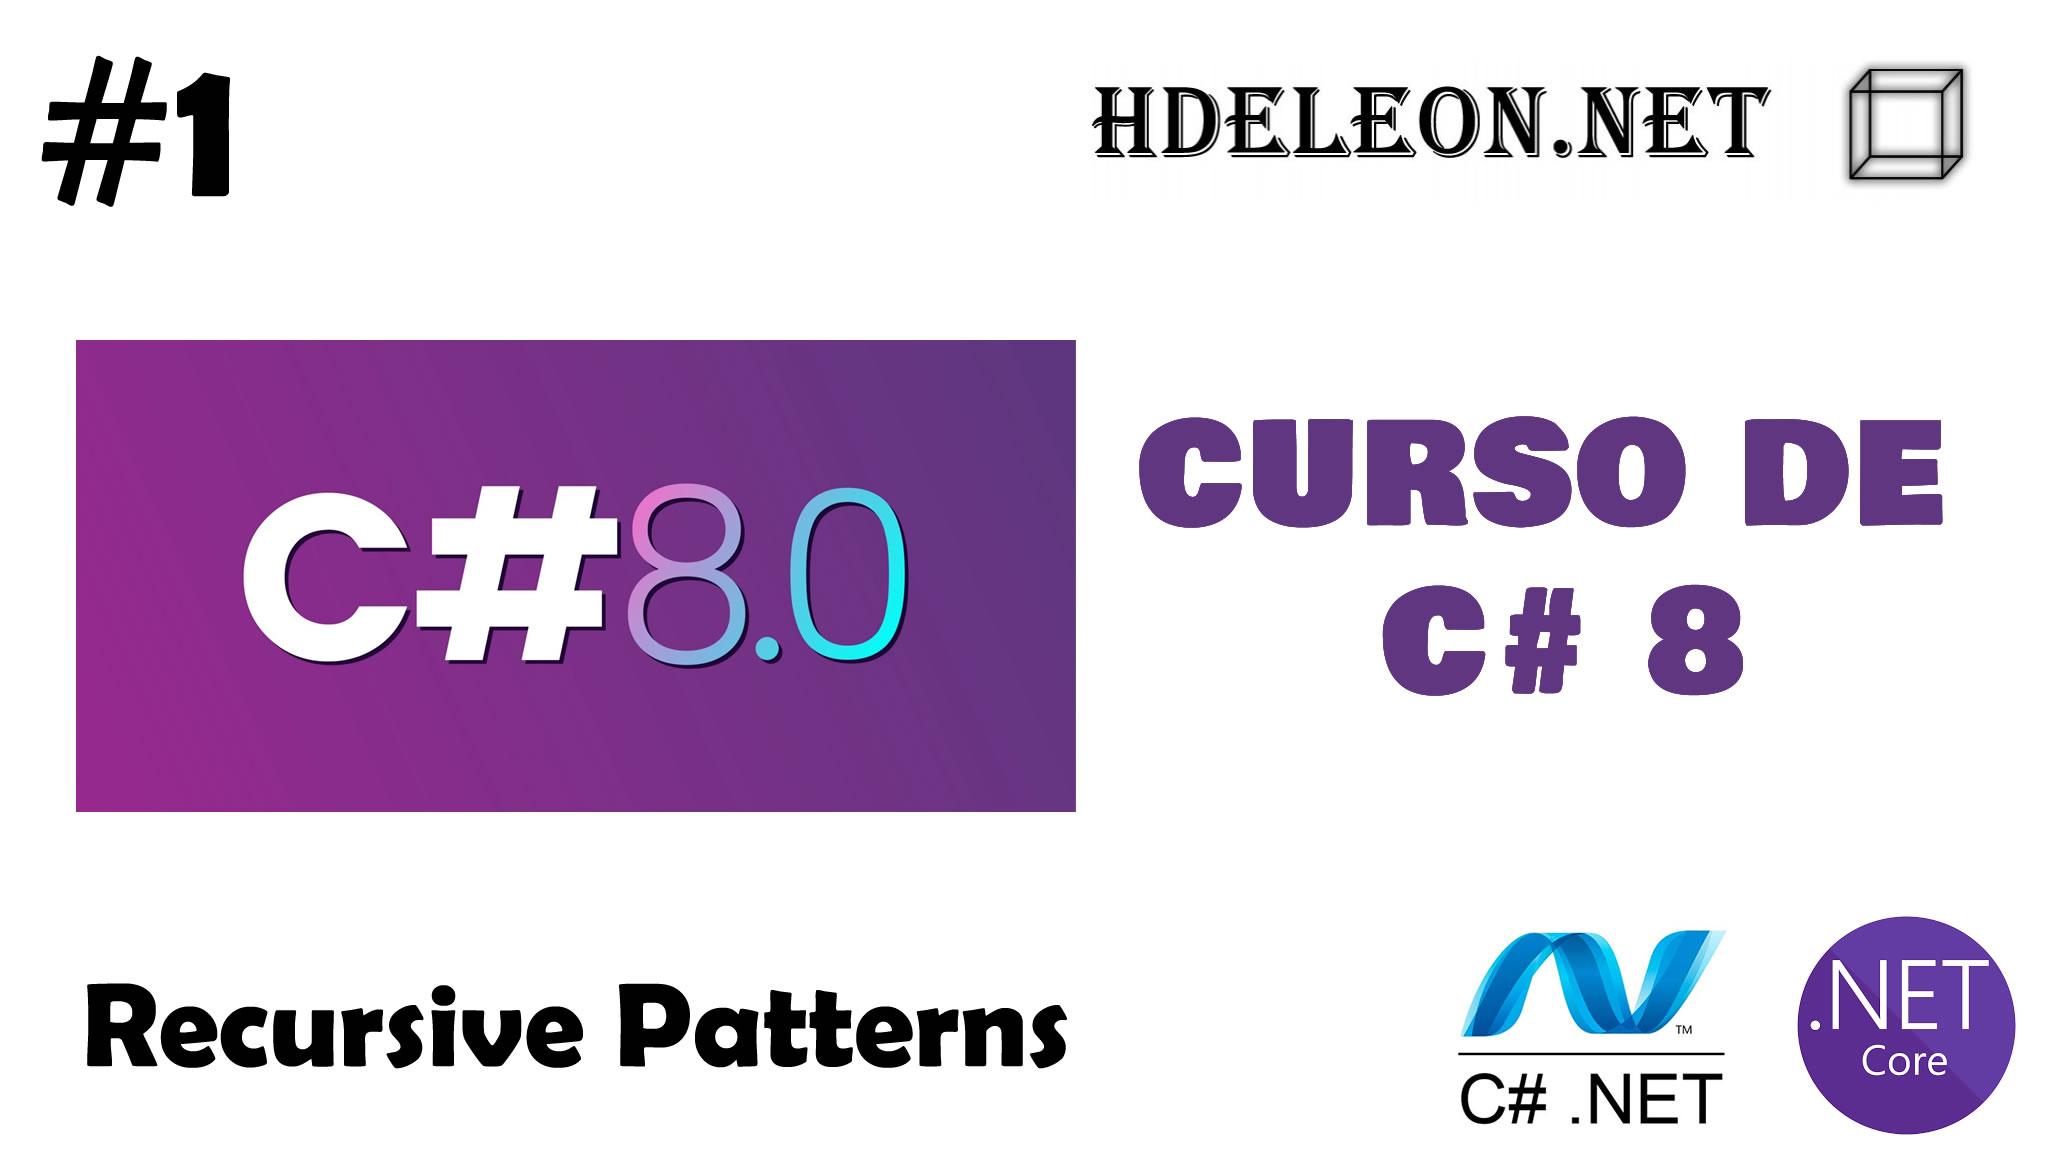 Curso gratuito de C# 8 .Net, Ranges e Indices, #2